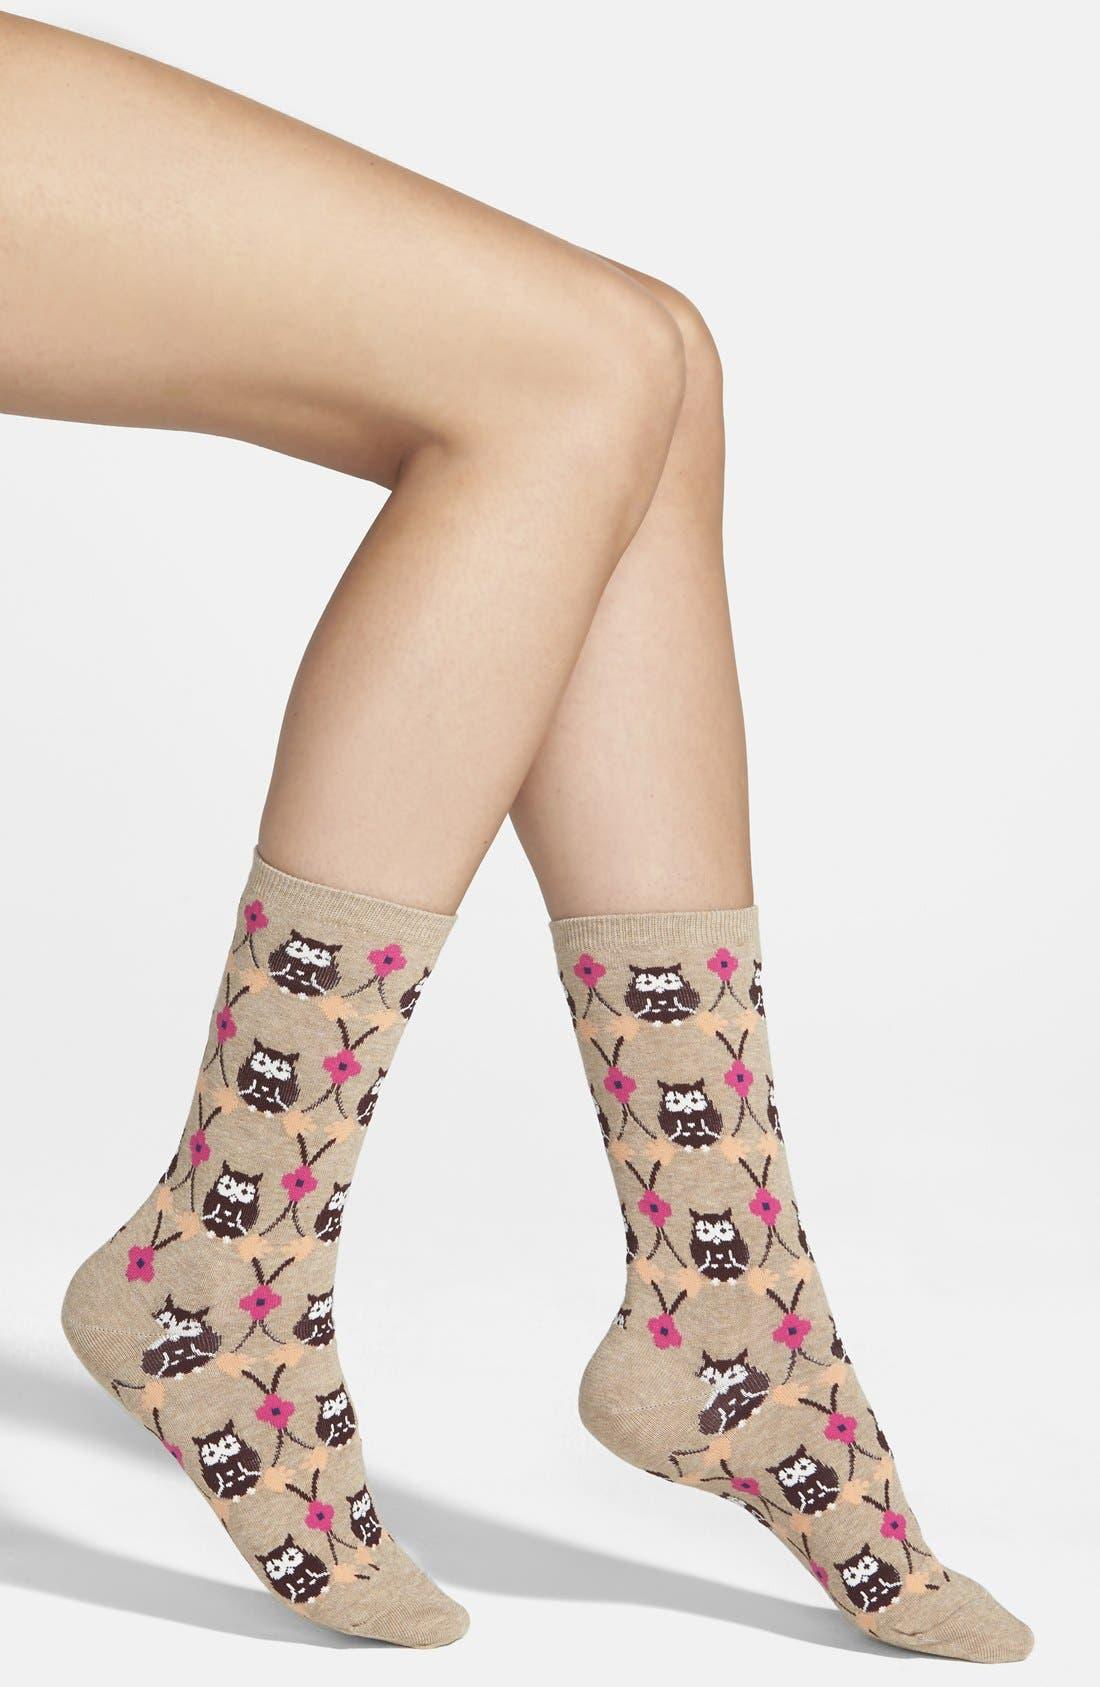 Alternate Image 1 Selected - Hot Sox 'Owl' Crew Socks (3 for $15)